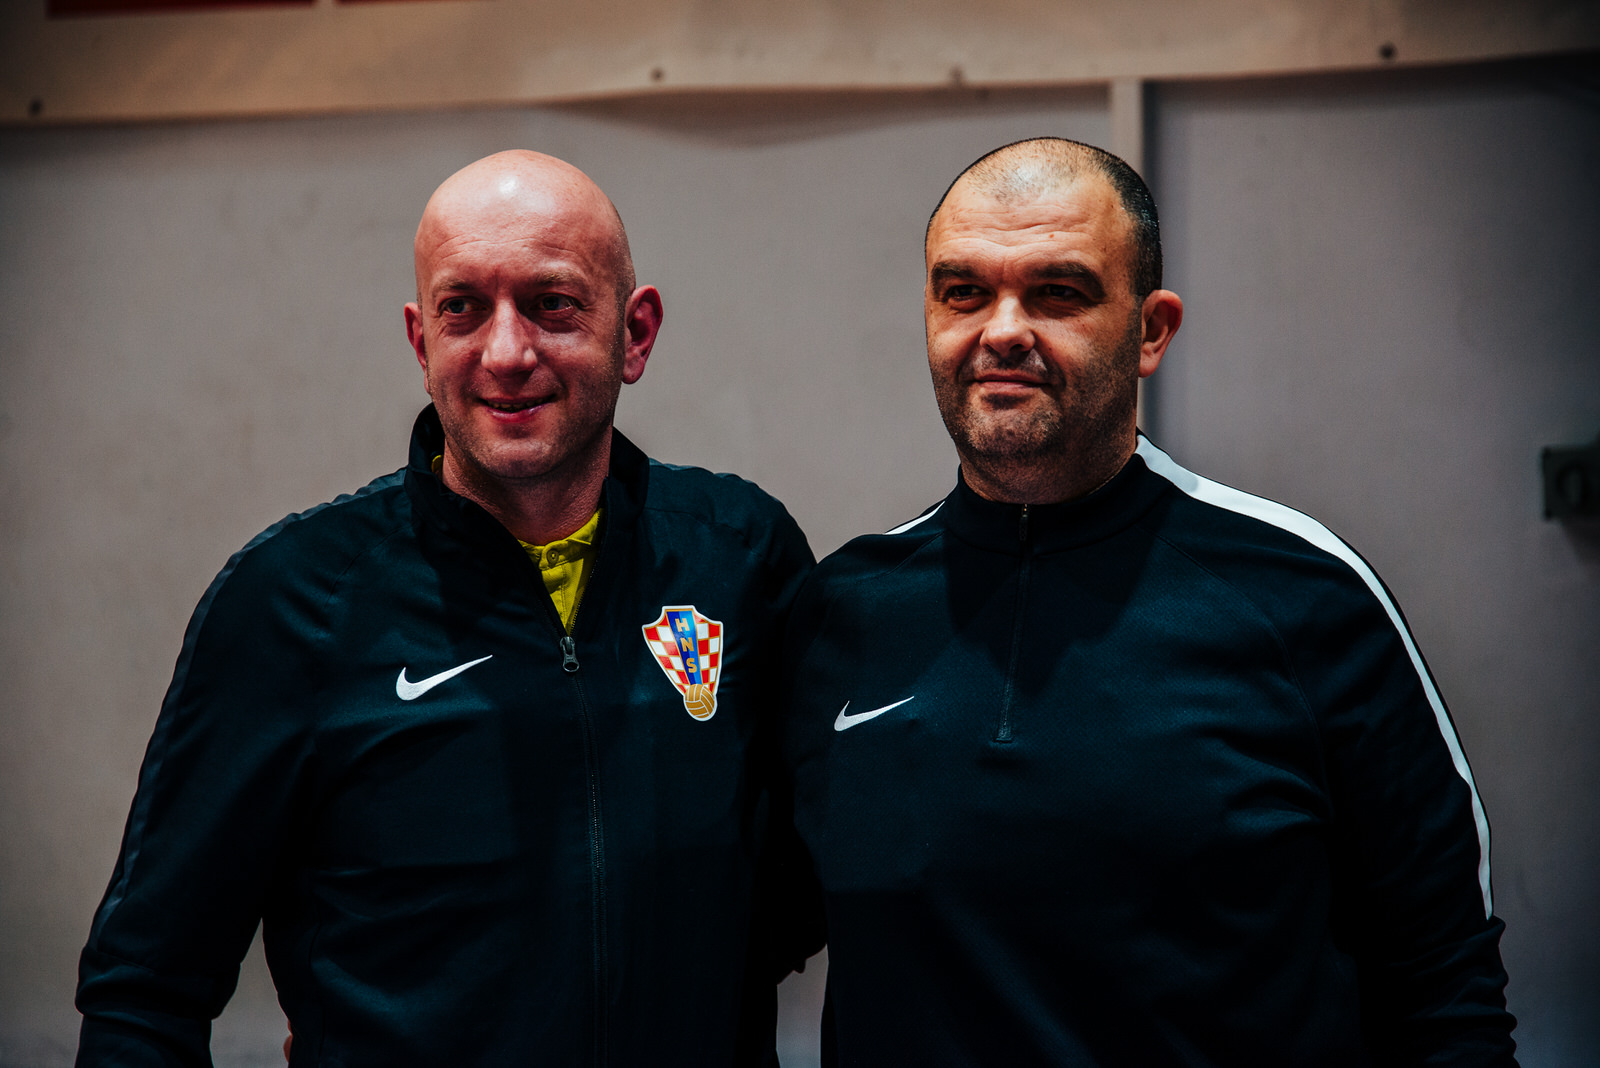 likaclub_zimska-malonogometna-liga-gospić_2019-20-124